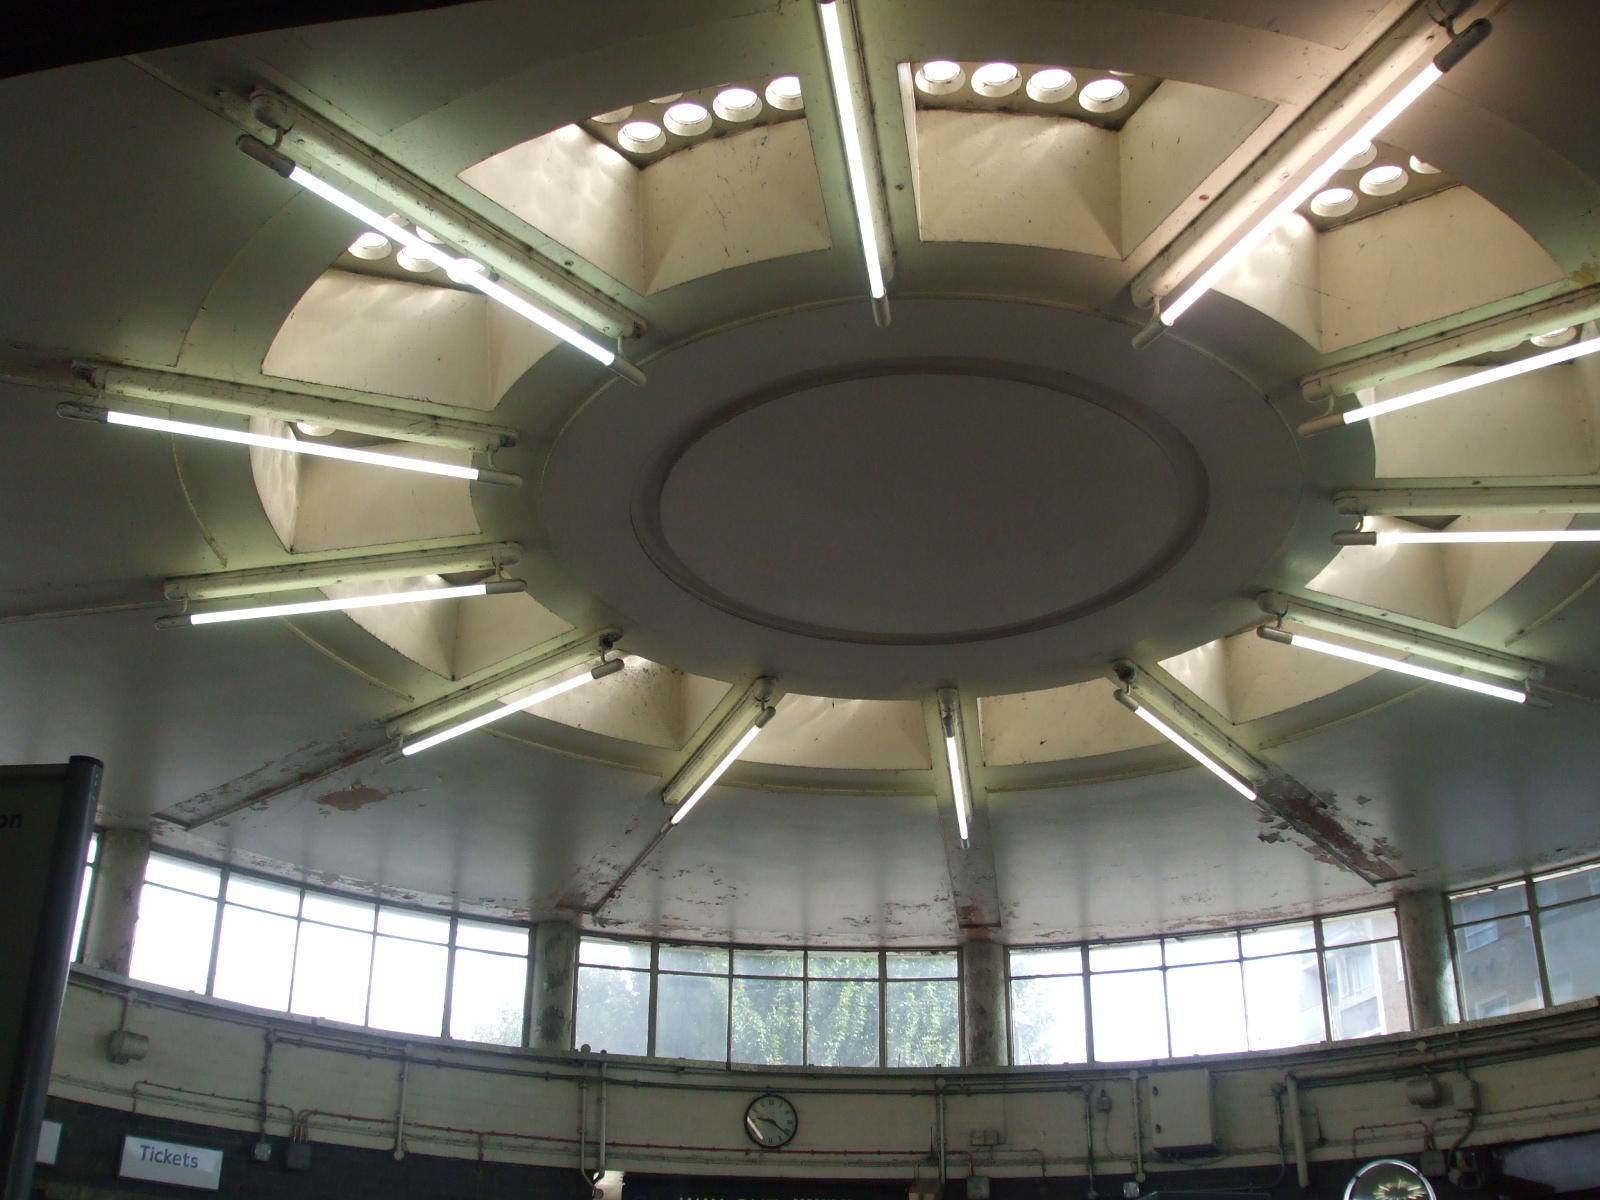 File:Redbridge station ticket hall ceiling.JPG - Wikimedia ...